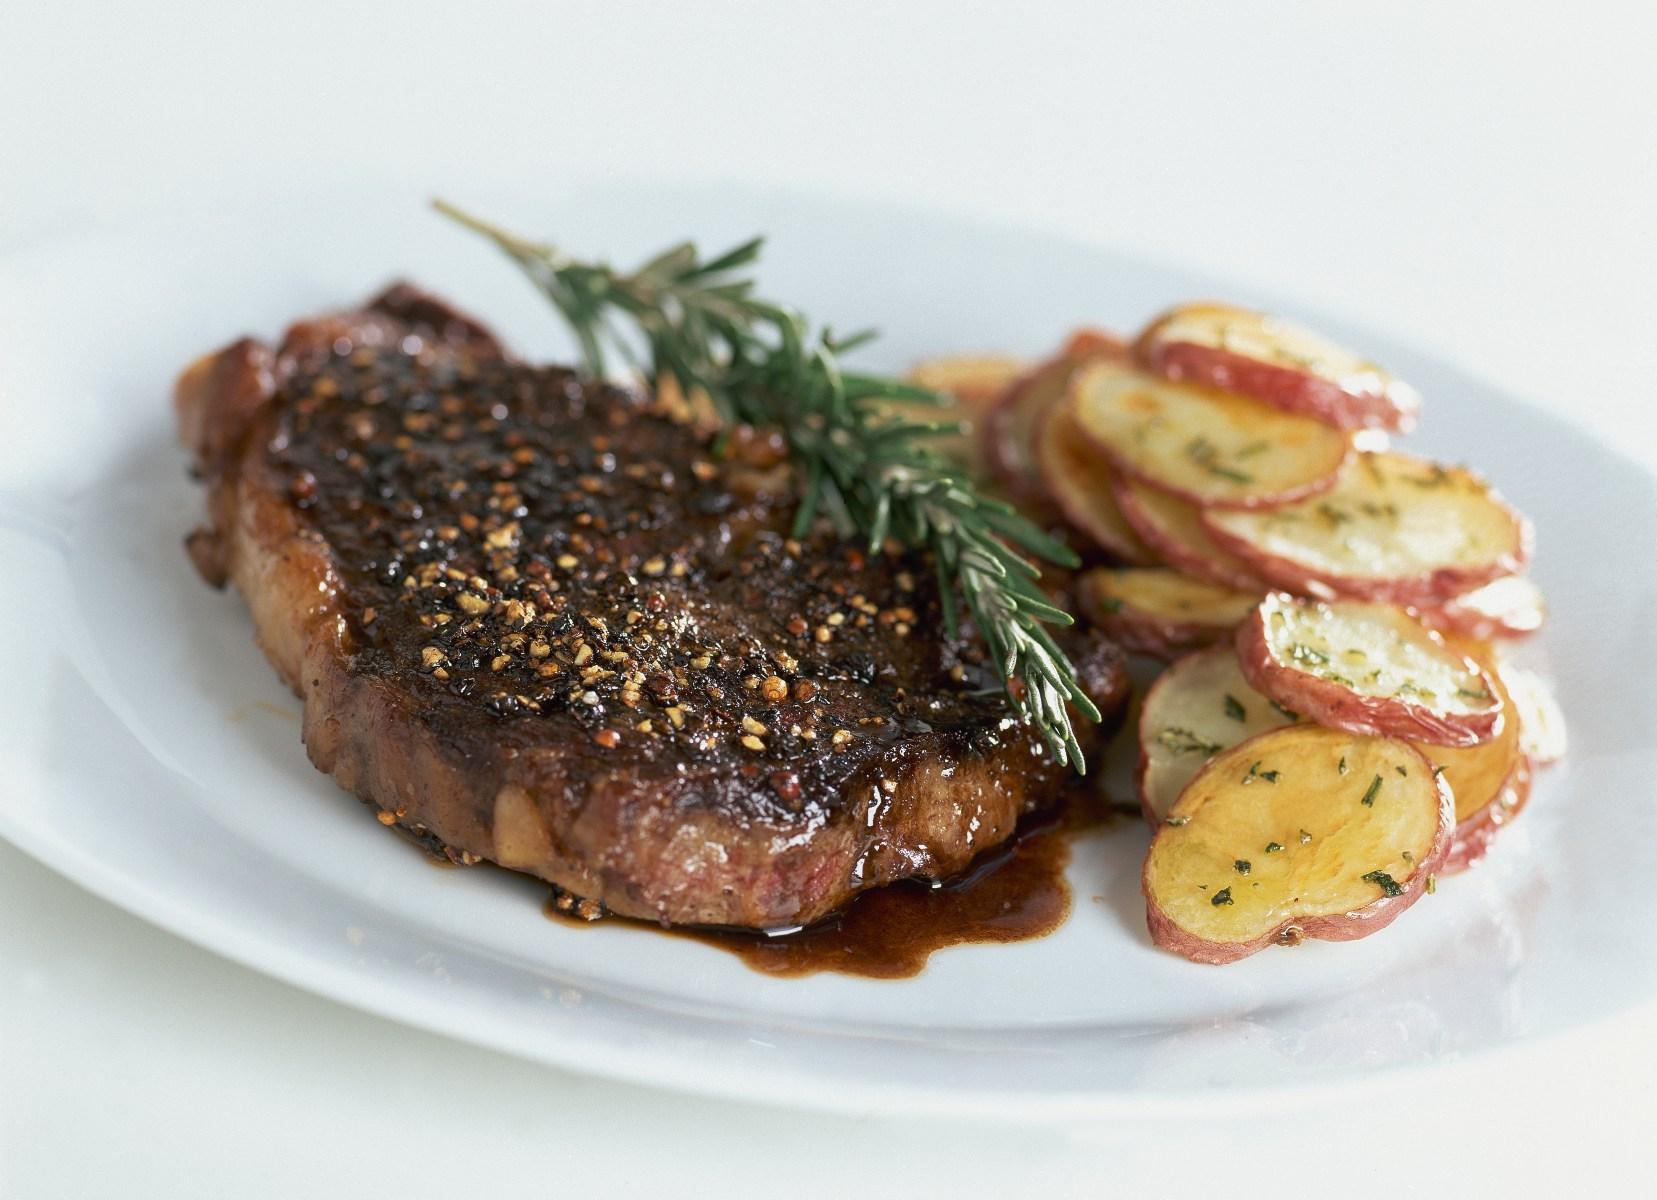 Rib-eye steak au poivre with balsamic reduction. Recipe by Lori W. Powell. (Photo byRomulo Yanes/Condé Nast via Getty Images)